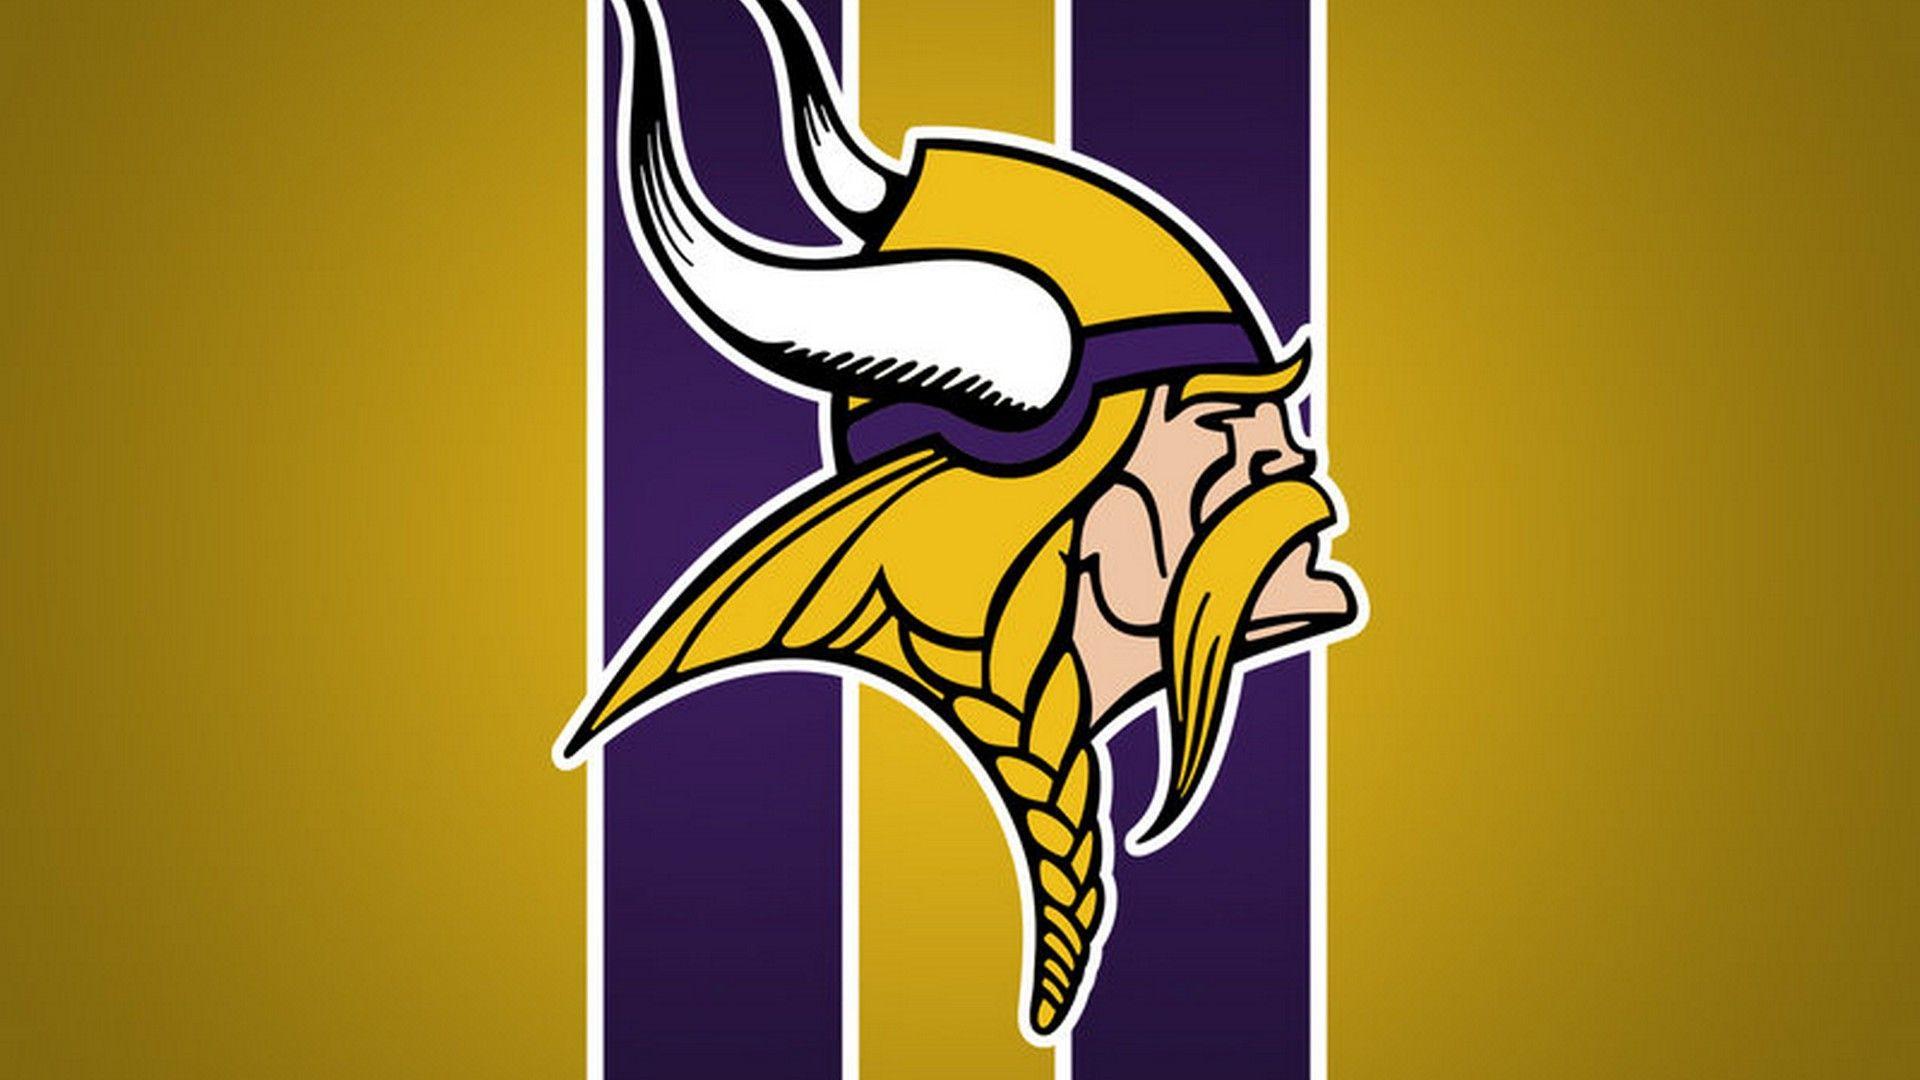 Hd Minnesota Vikings Backgrounds Nfl Football Wallpaper Minnesota Vikings Wallpaper Minnesota Vikings